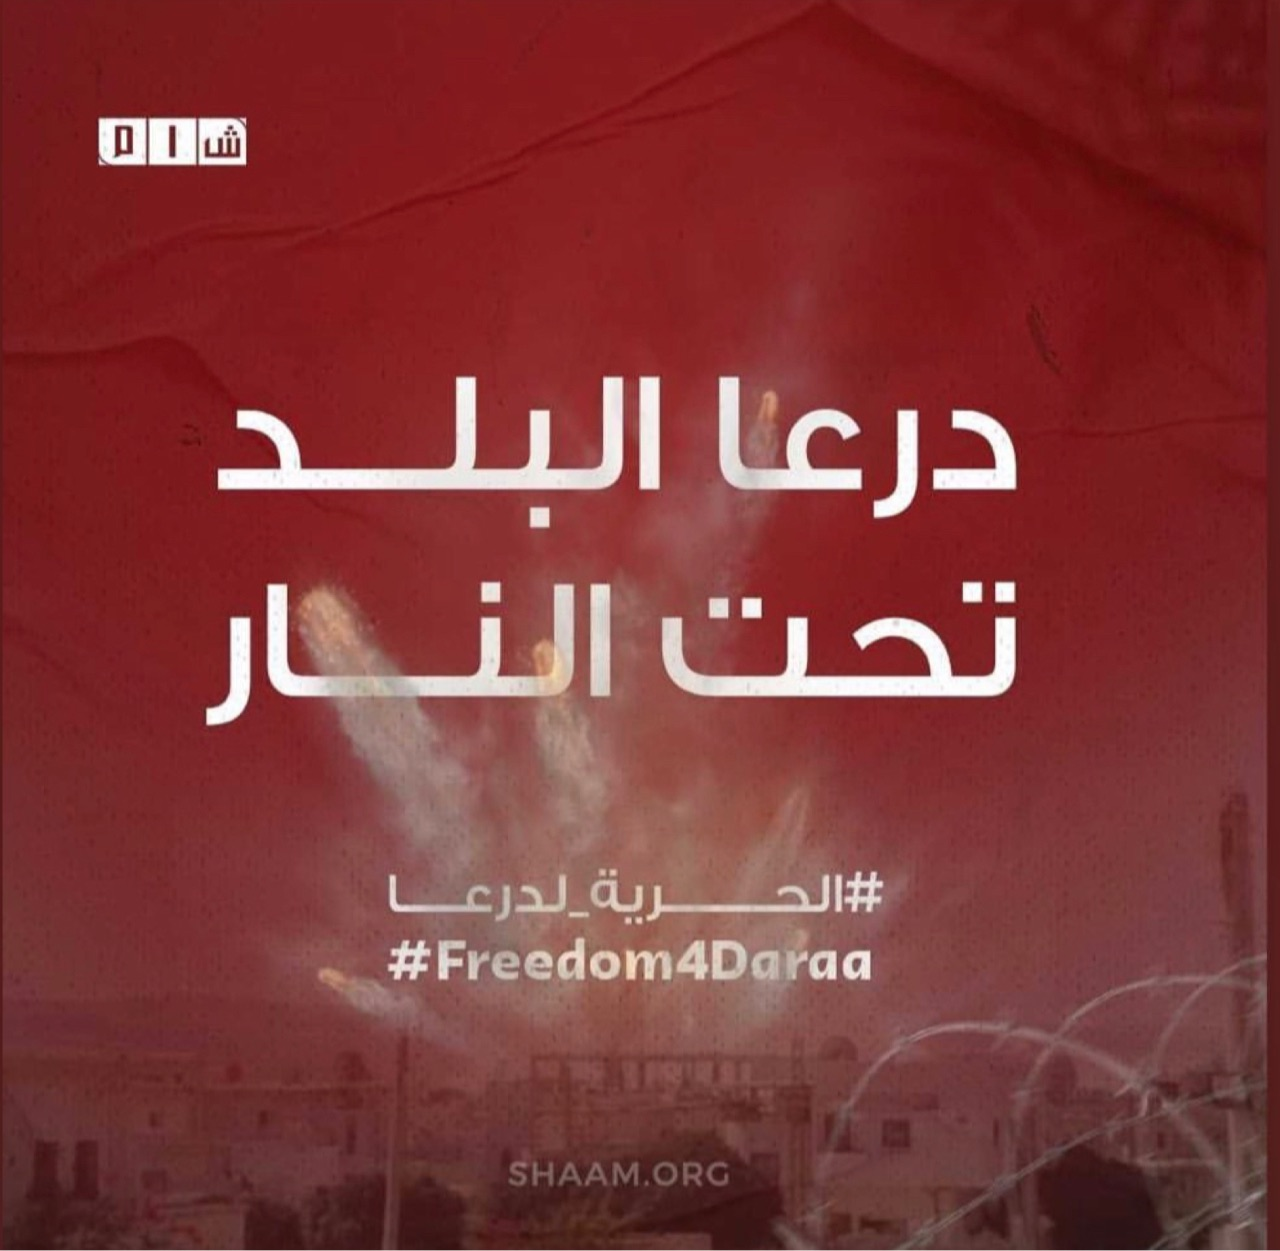 freedom, nado, and حرّية image